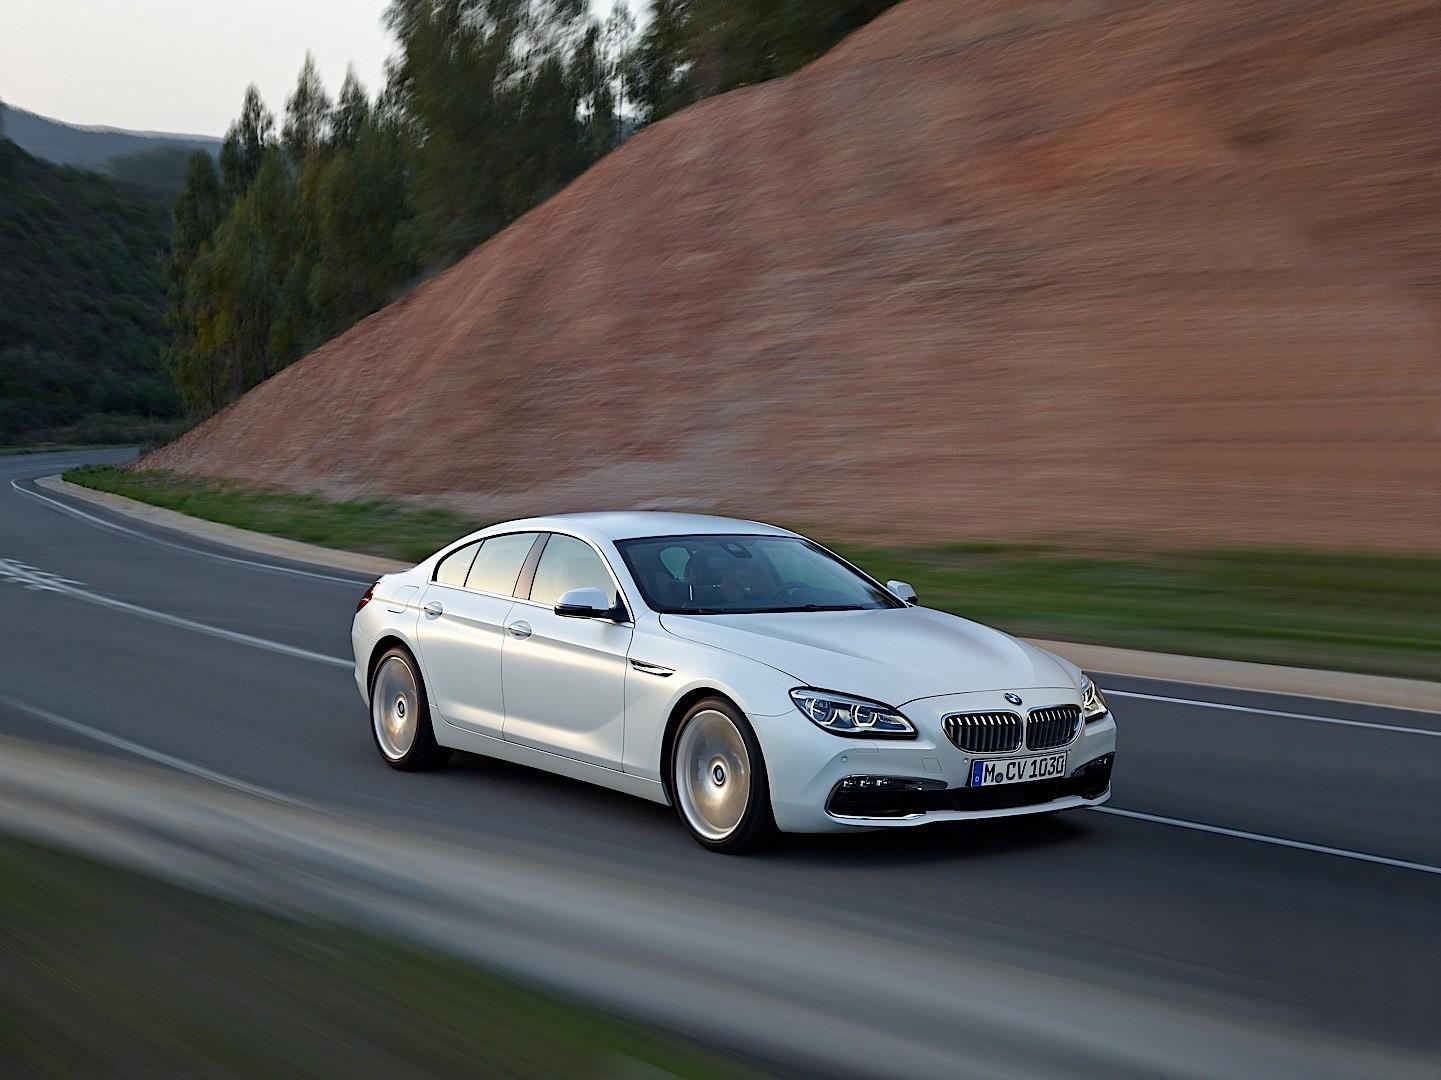 Coupe Series bmw 650i 2015 BMW 6 Series Gran Coupe LCI (F06) specs - 2015, 2016, 2017, 2018 ...